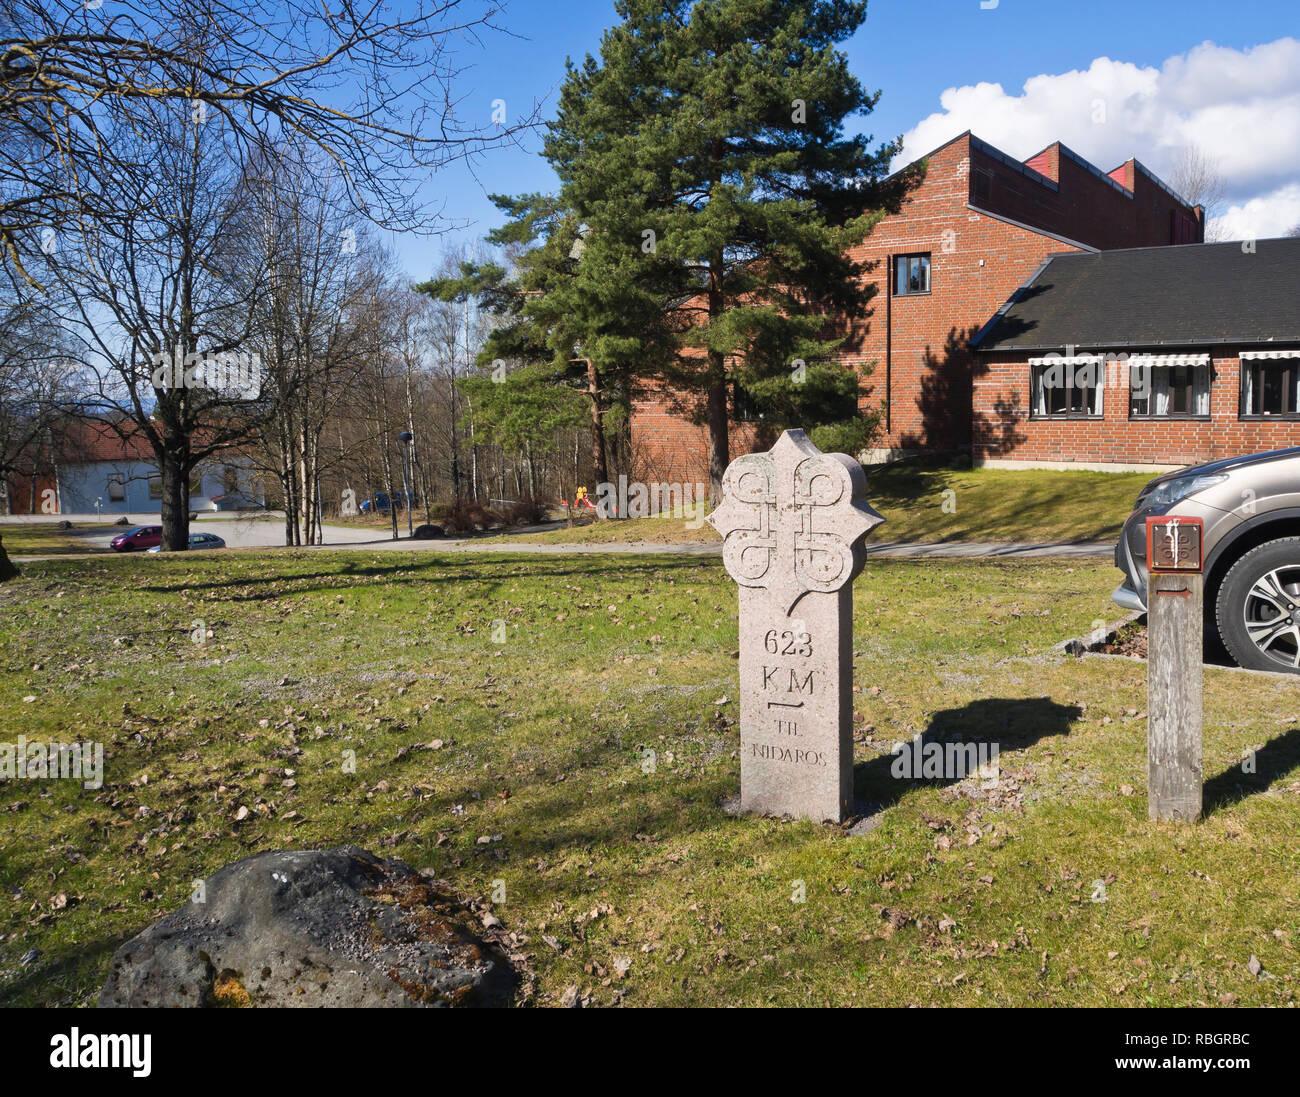 Modern milestone in granite signposting the popular pilgrimage route to Trondheim and Nidaros set up in the Furuset suburb in Oslo Norway - Stock Image